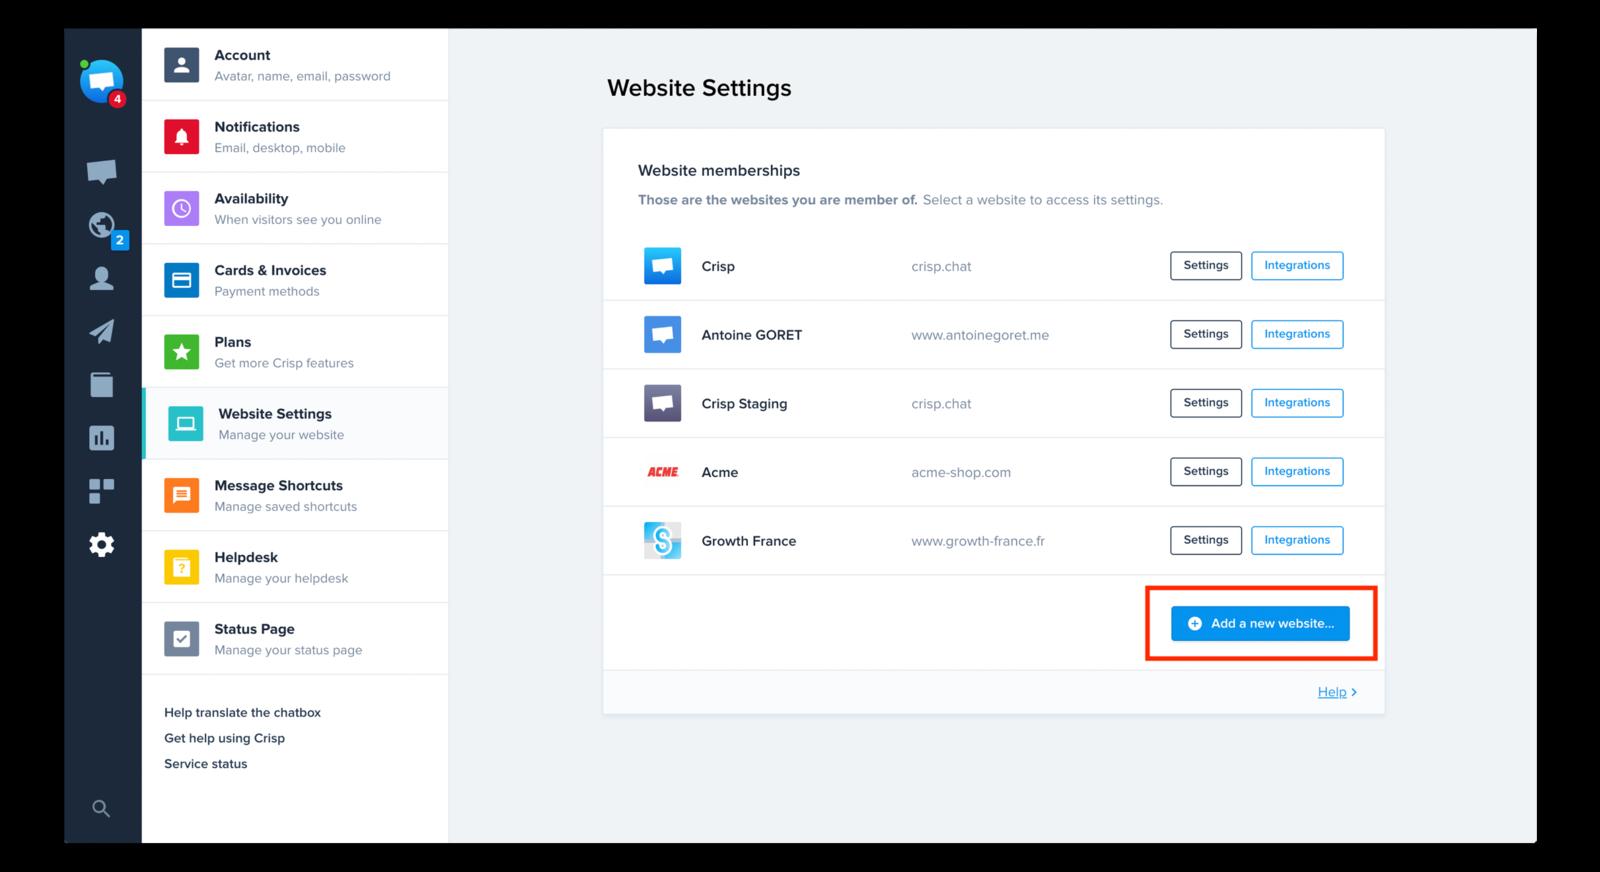 Click Create a new website